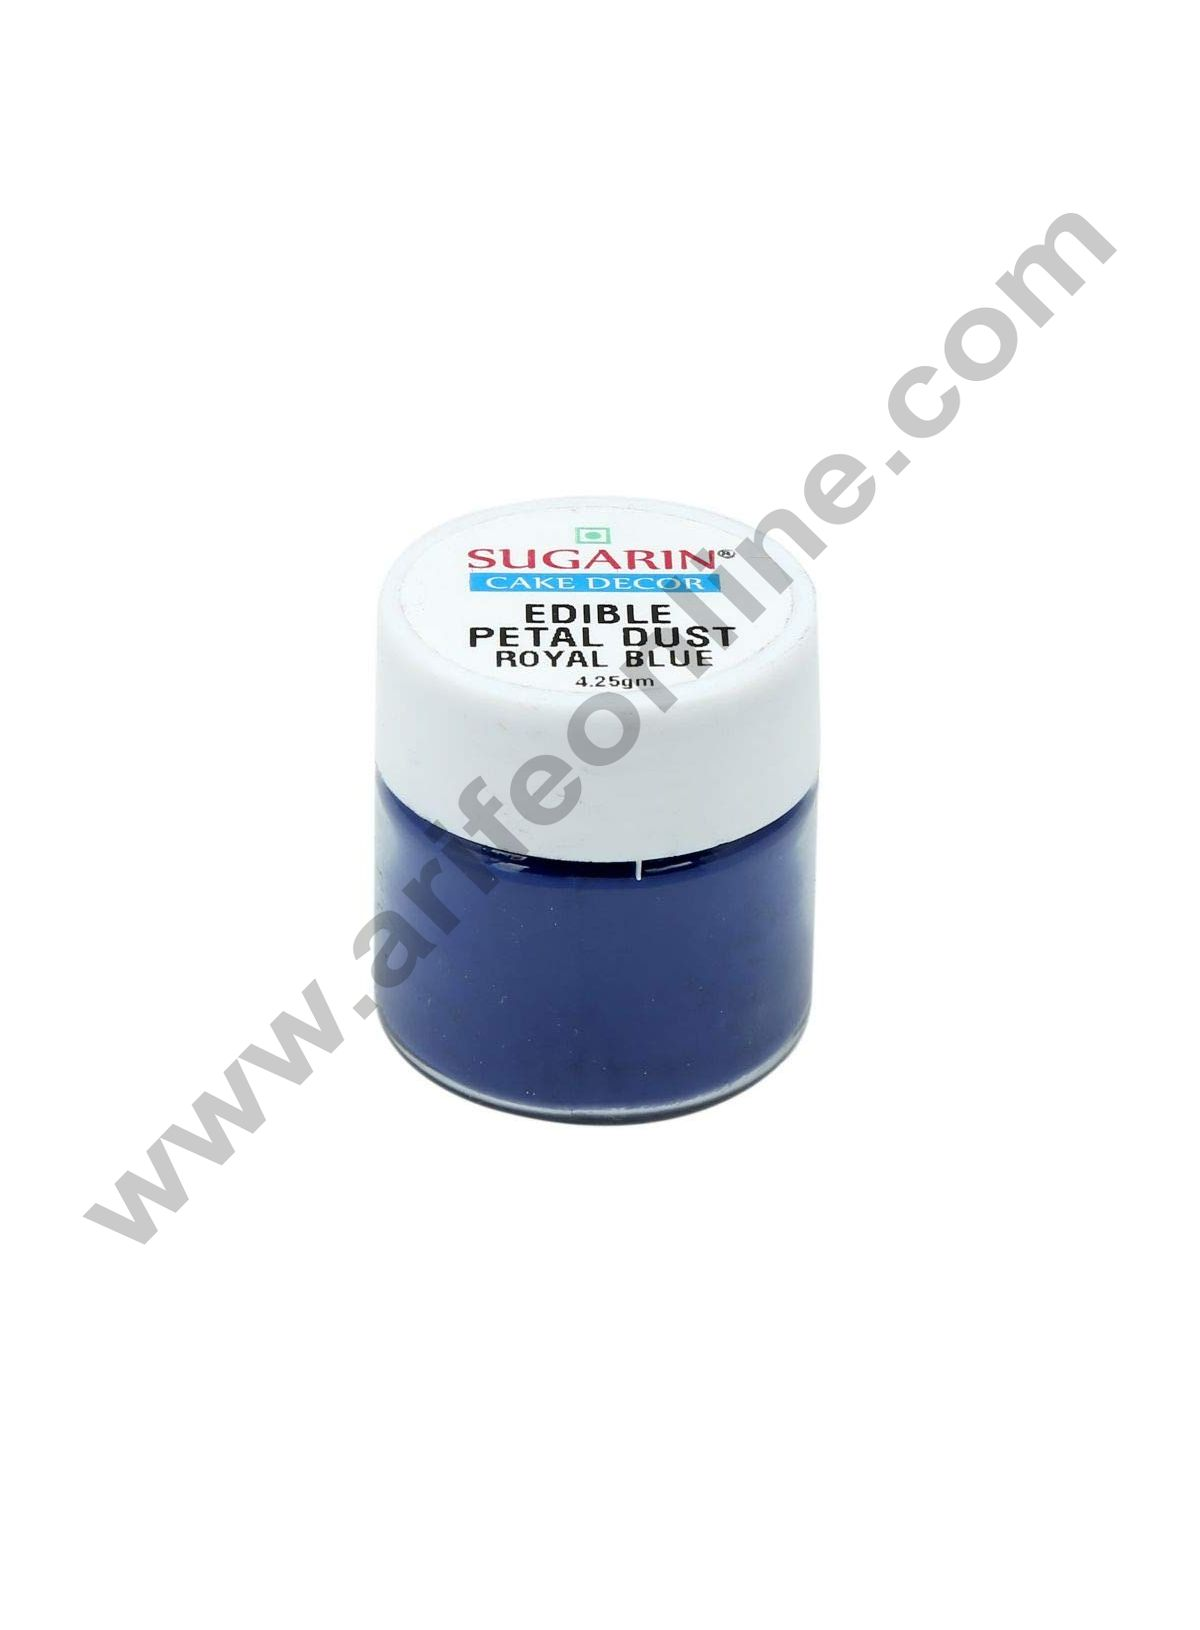 Sugarin Edible Petal Dust, Royal Blue, 4.25gm